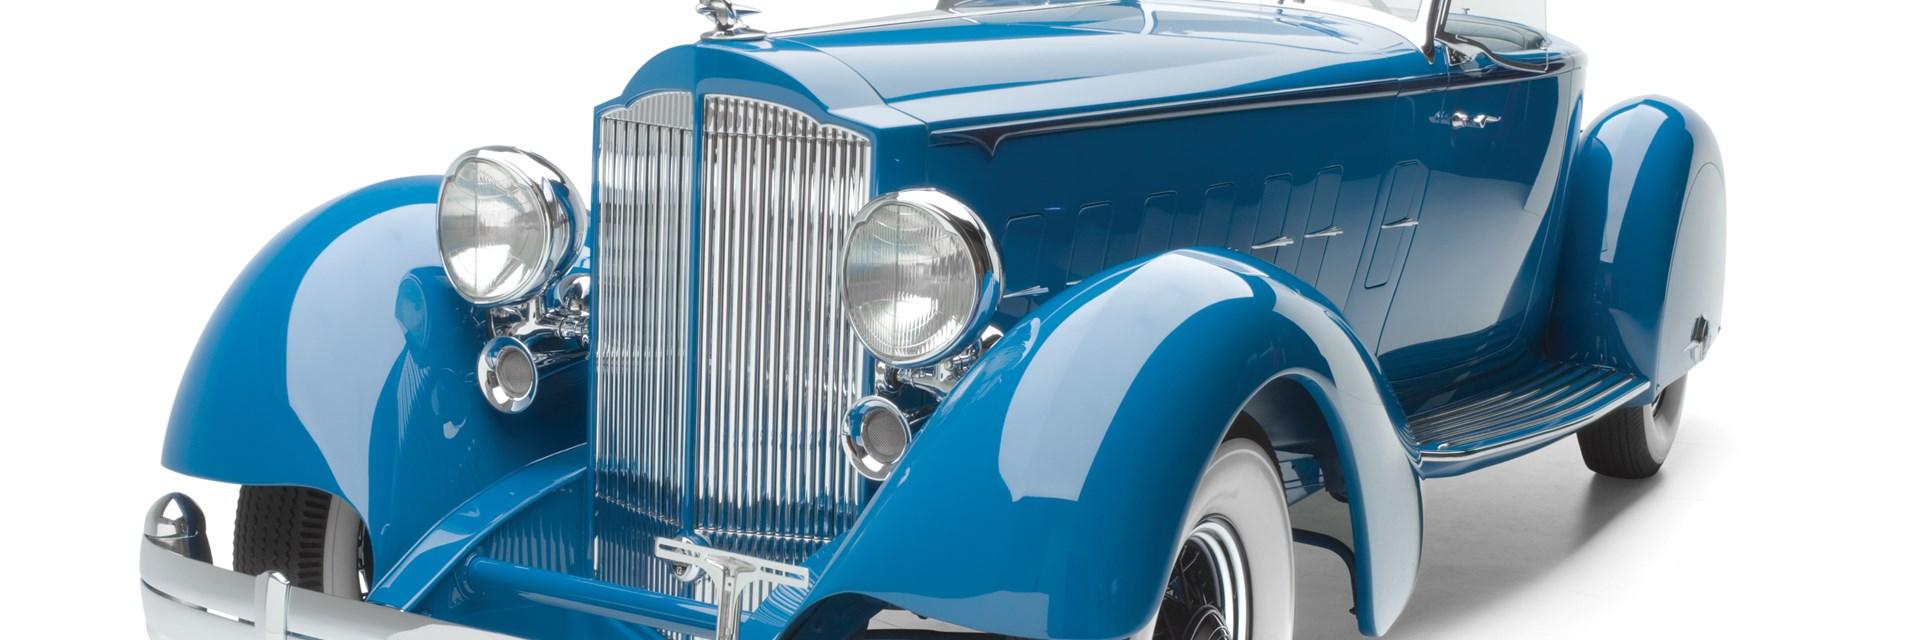 Vintage Motor Cars in Arizona